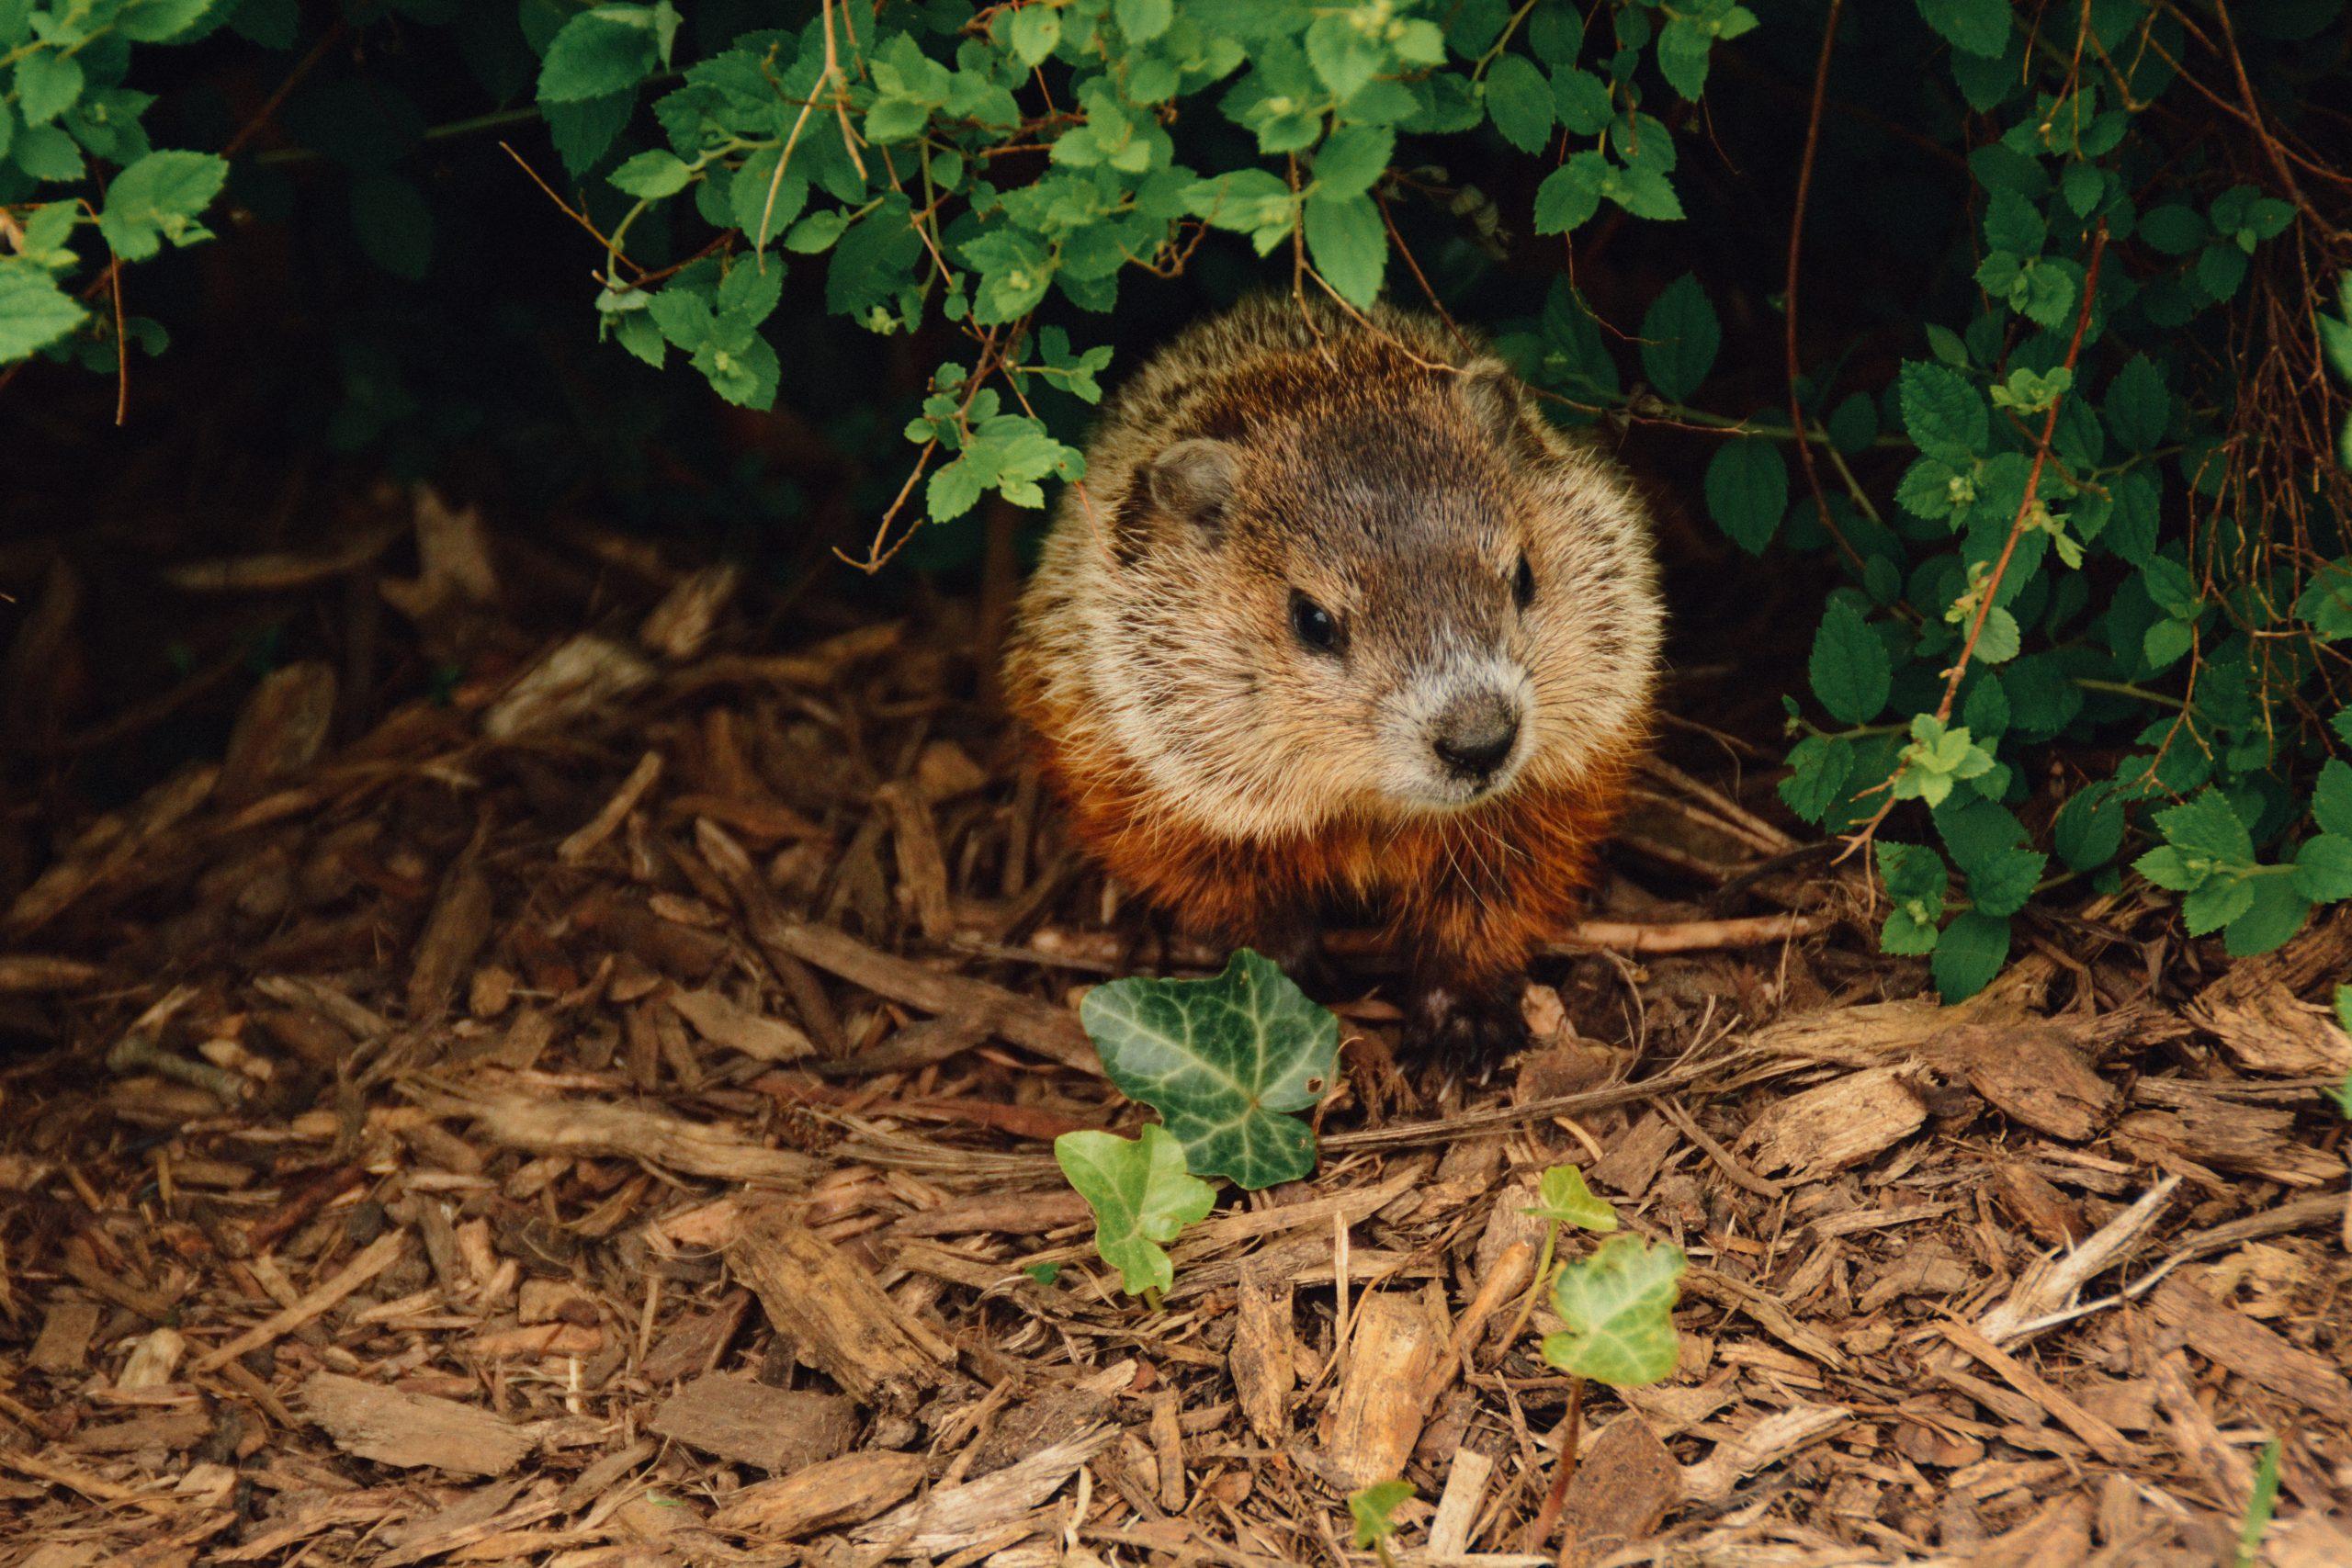 Episode 05 : The Groundhog